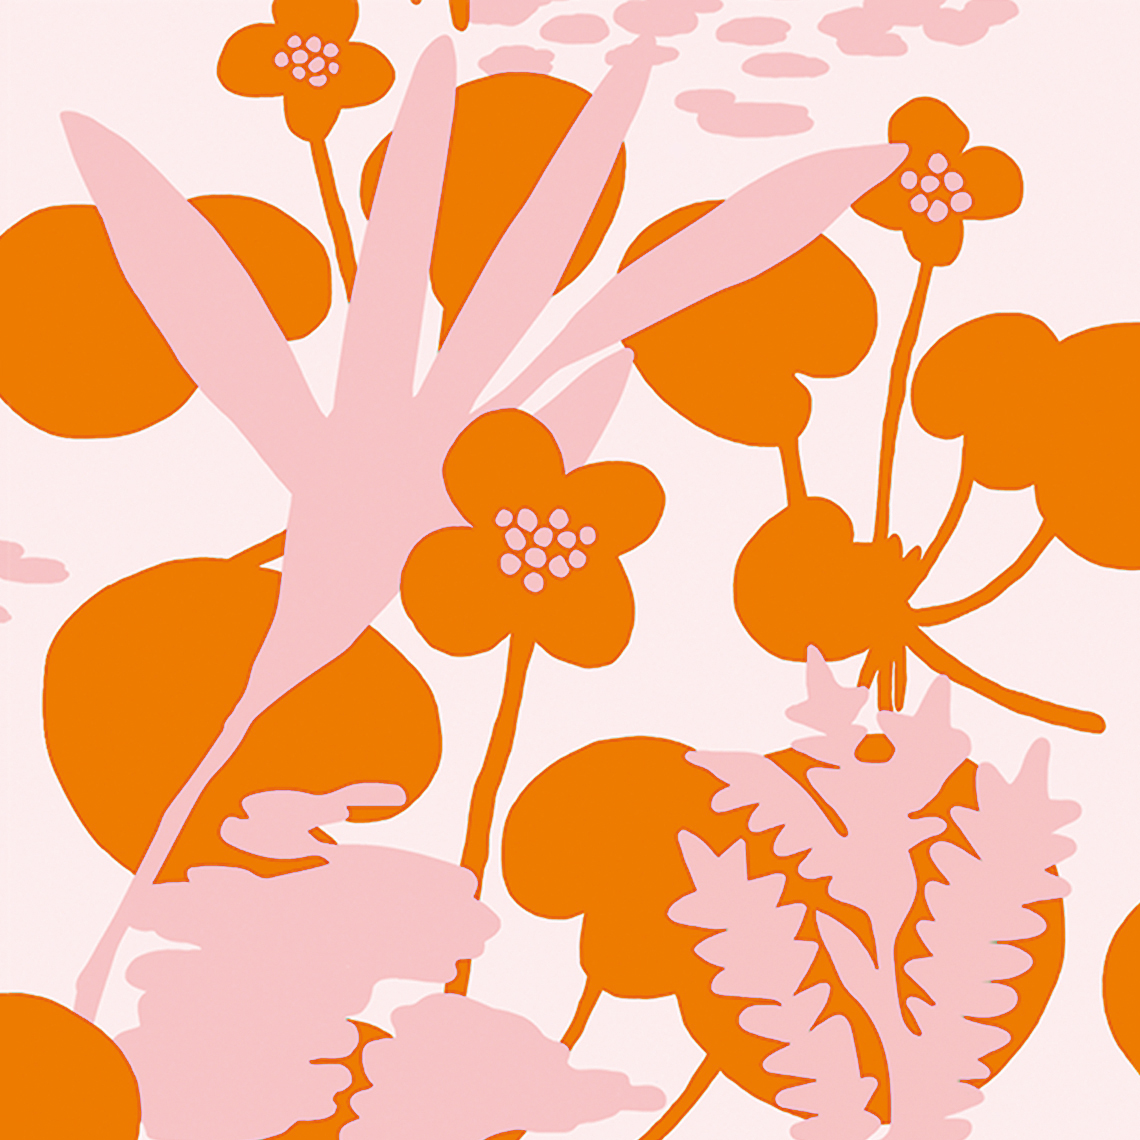 Wetland flowers patterns